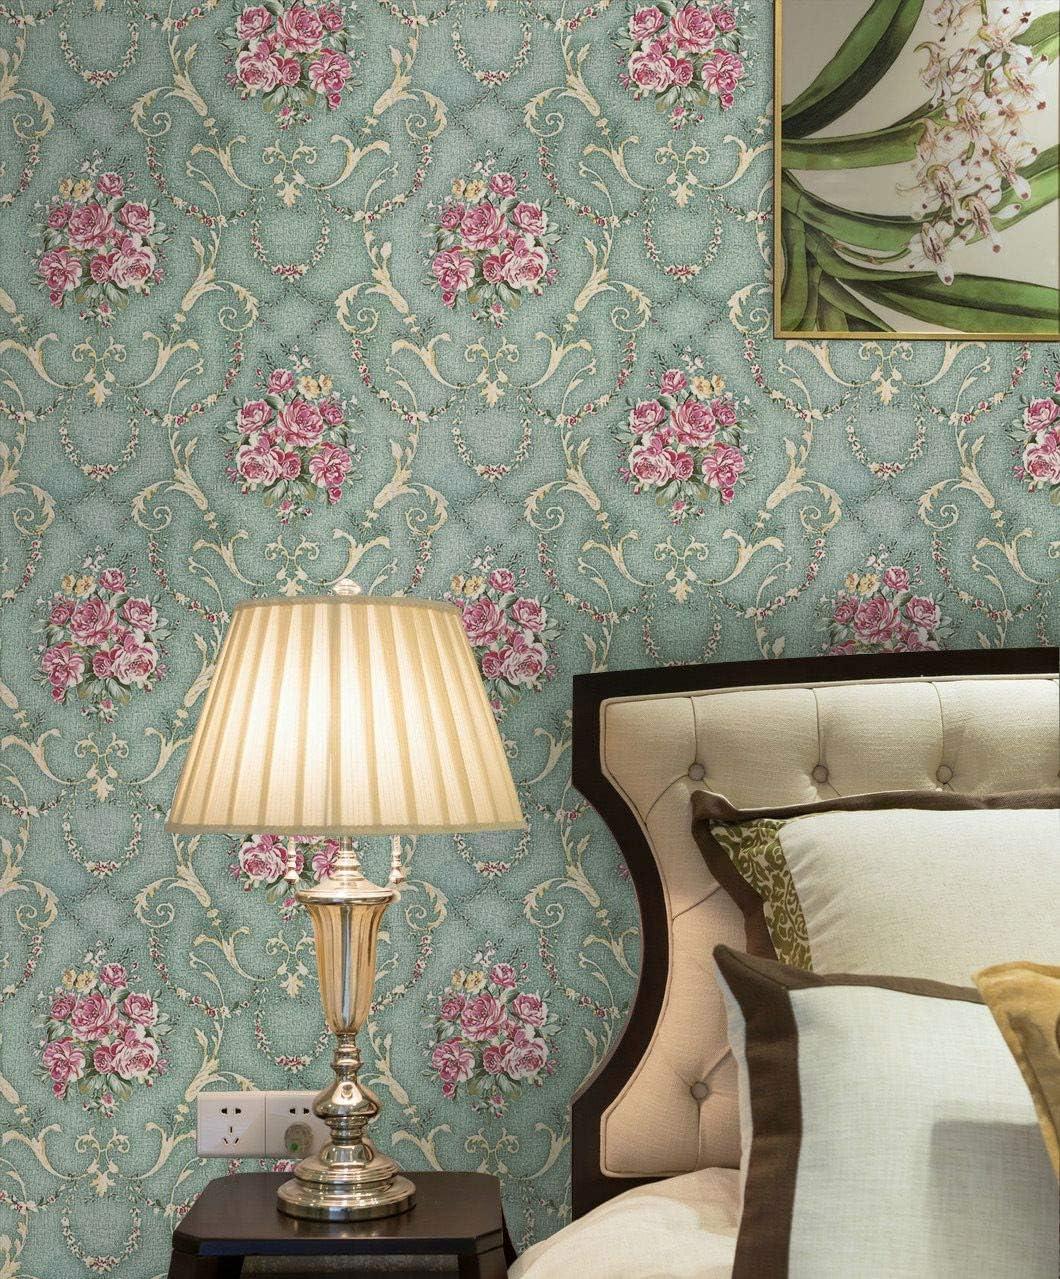 "Green Floral Wallpaper Retro Peel and Stick Wallpaper Self Adhesive Removable Vintage Rustic Wallpaper 17.7""X118"" Waterproof Vinyl Decorative Countertop Cabinet Bedroom Easy to Cut"